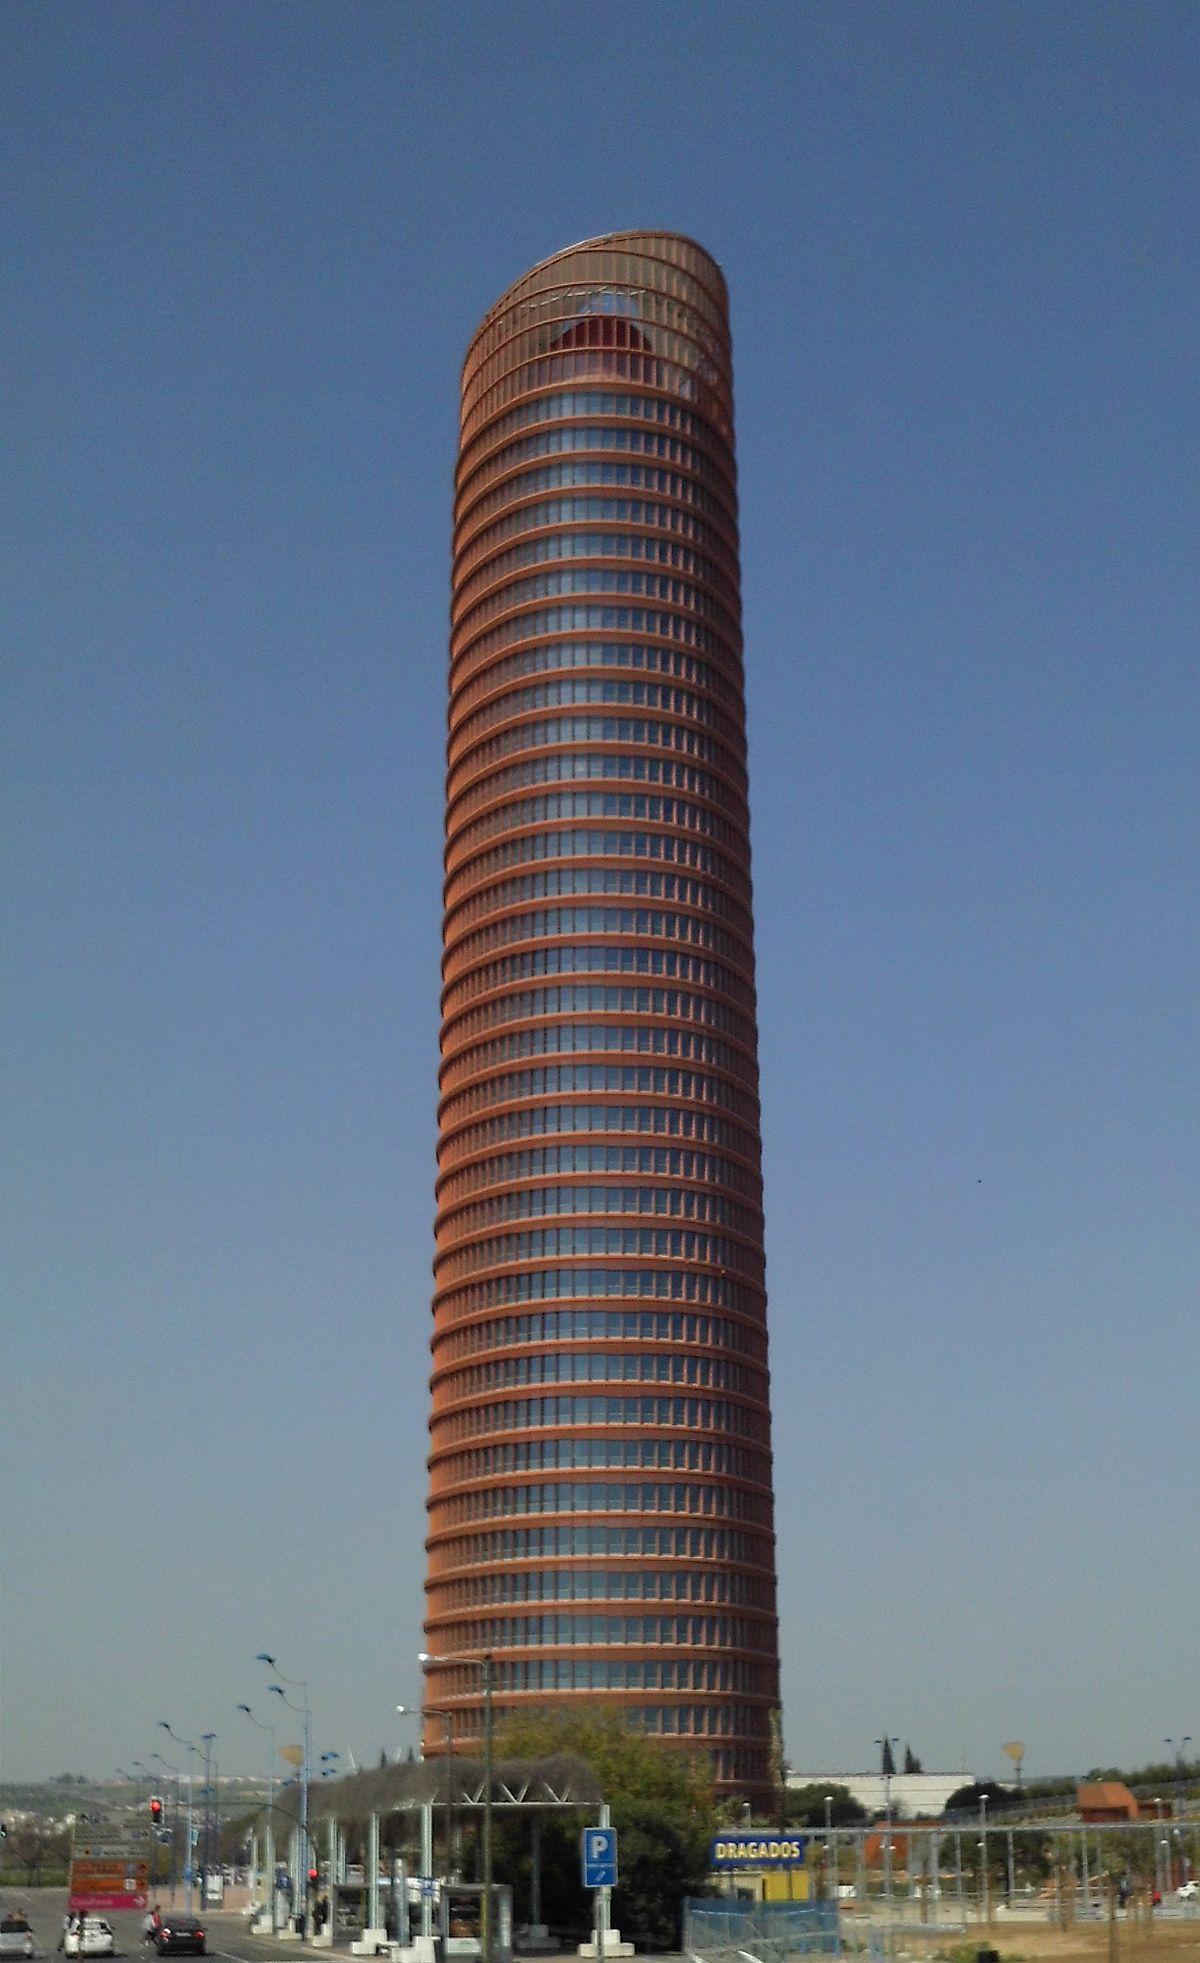 Torre sevilla wikipedia la enciclopedia libre for Oficinas caixa sevilla